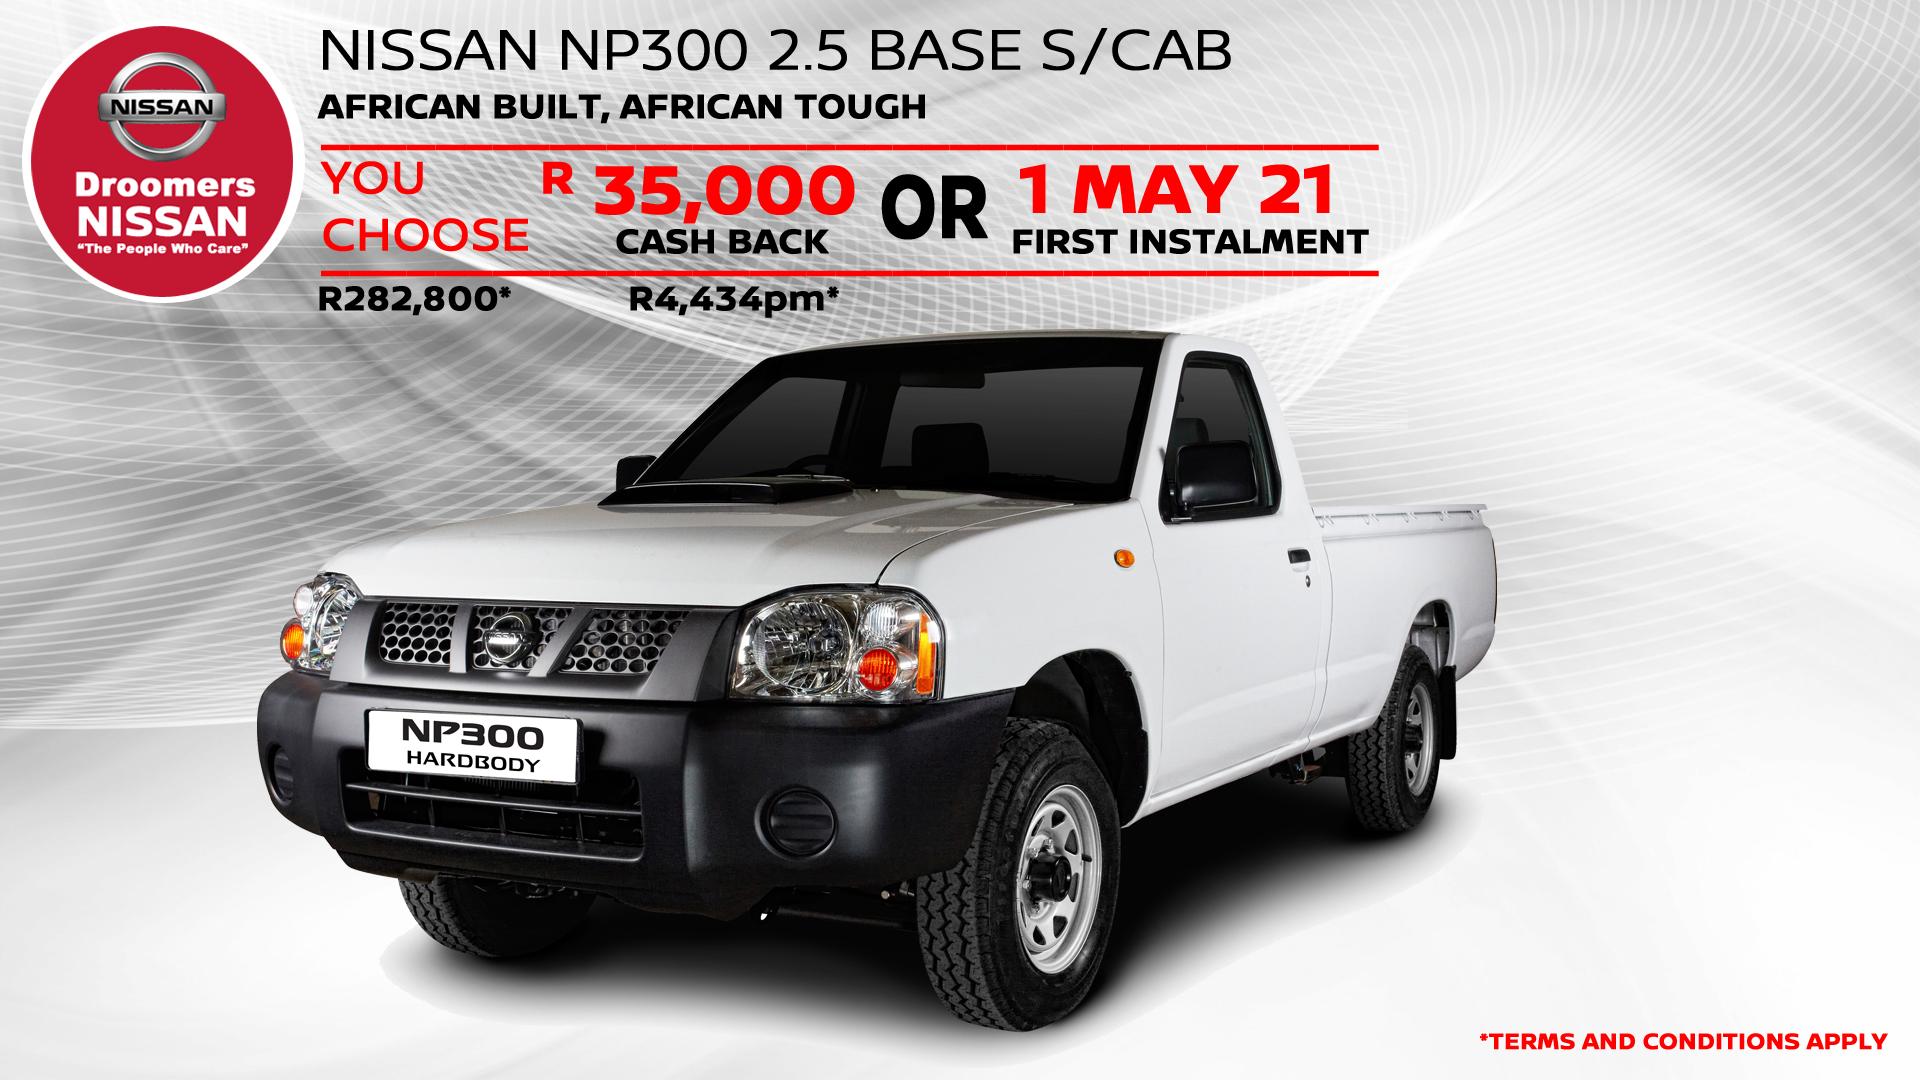 NISSAN NP300 2.5 BASE S/CAB